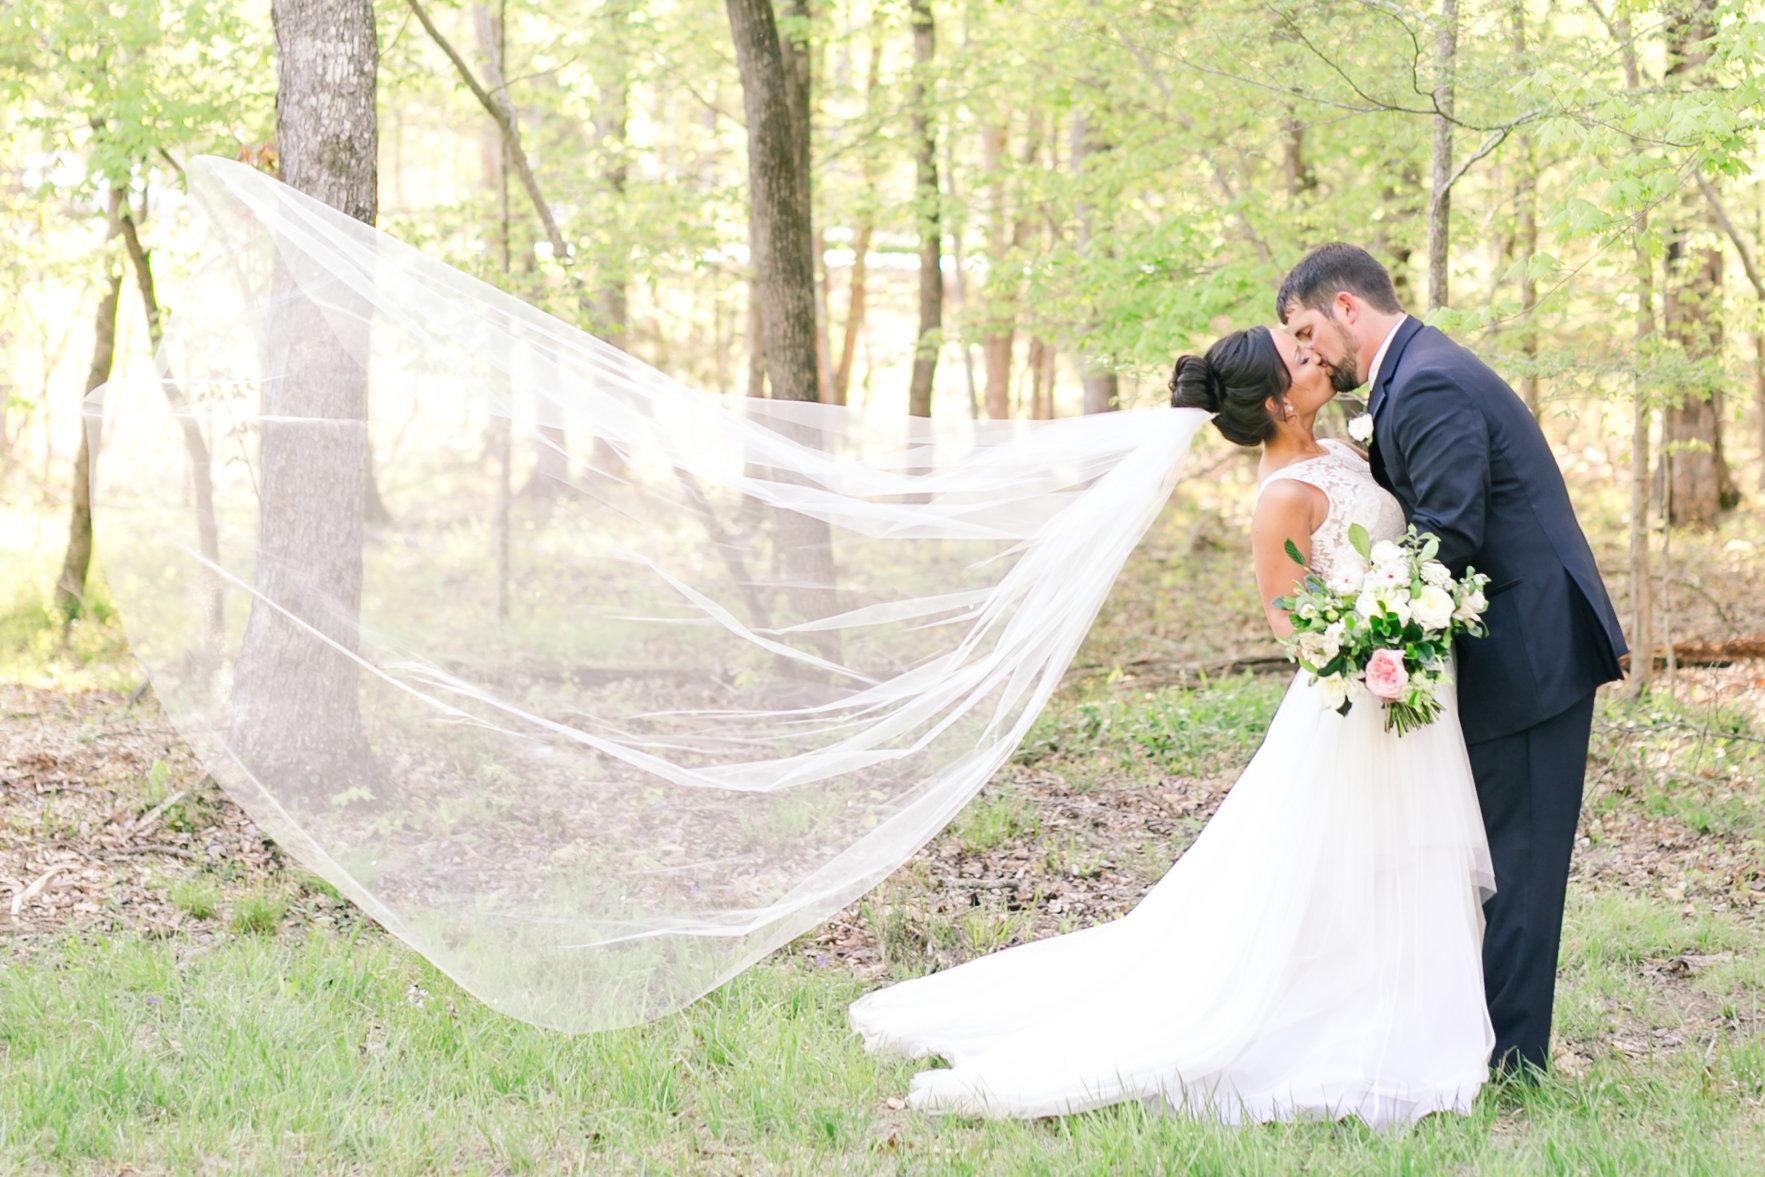 Alex Blair Wedding-Alex Blair Wedding 2-0033.jpg